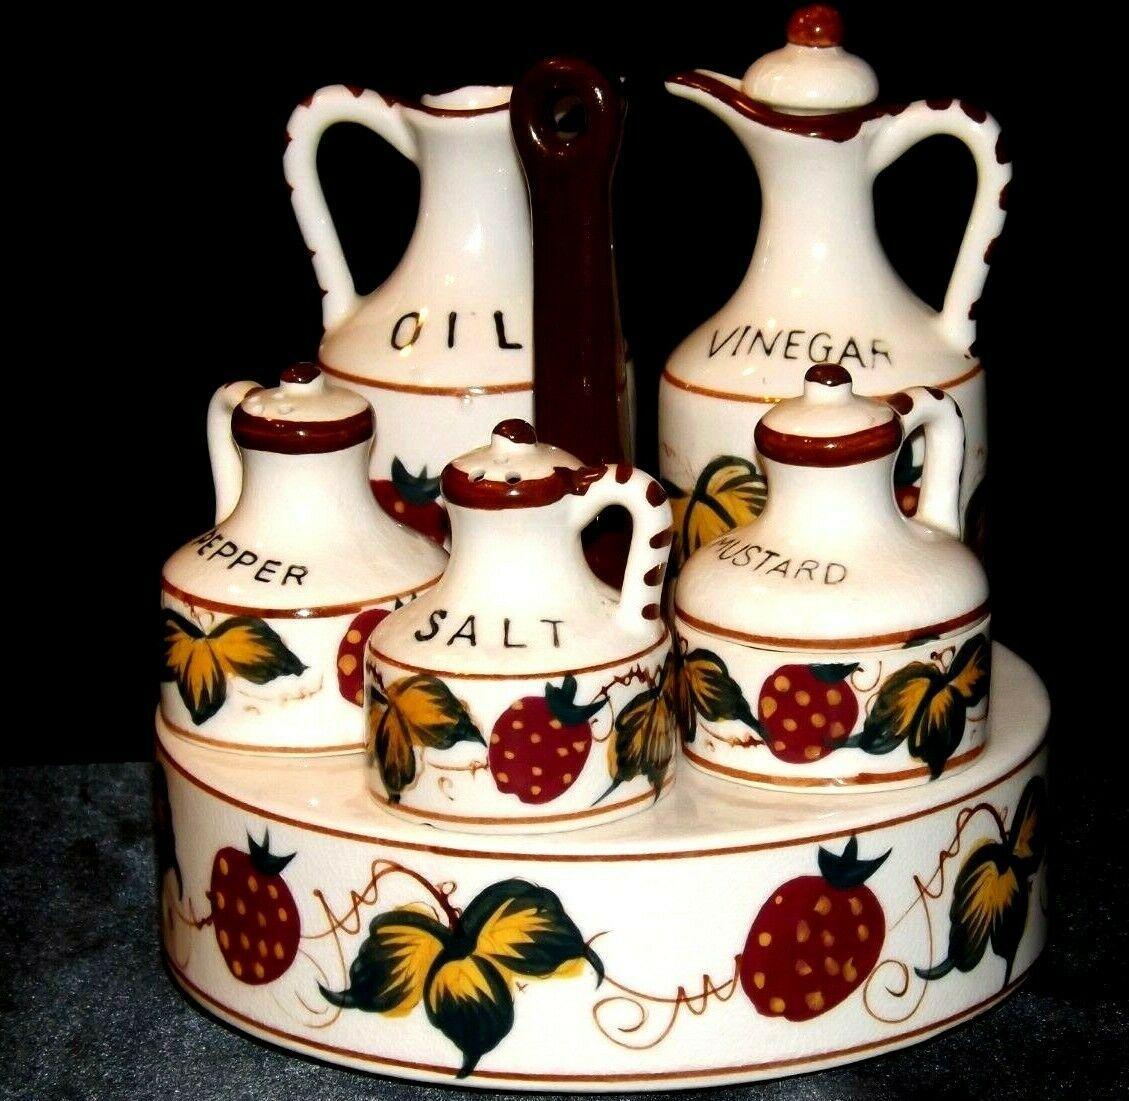 Ceramic Oil, Vinegar, Mustard, Salt, and Pepper on a Caddie AA19-1640 Vintage